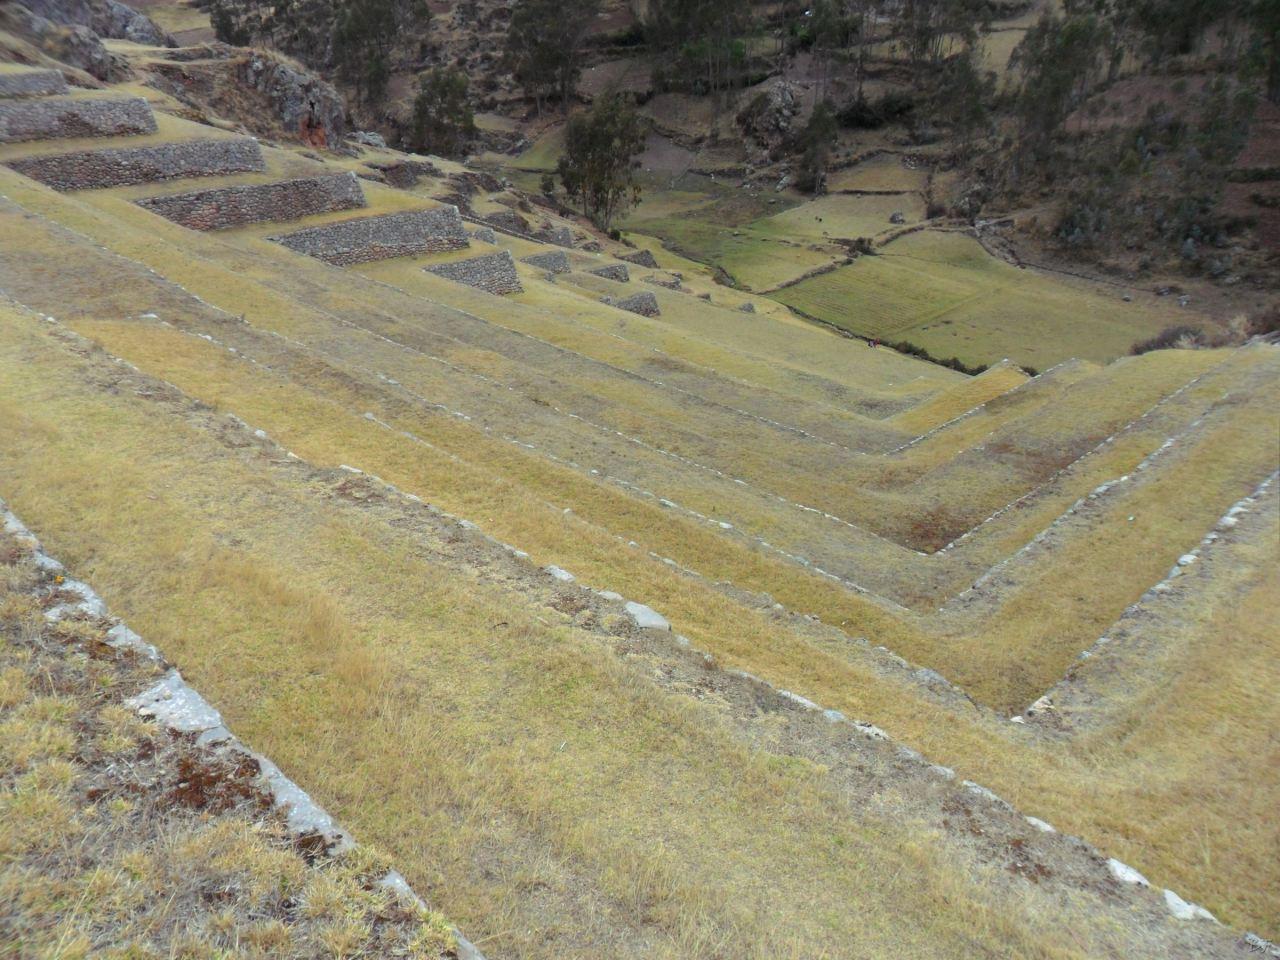 Chinchero-Mura-Poligonali-Piramide-Urubamba-Peru-84